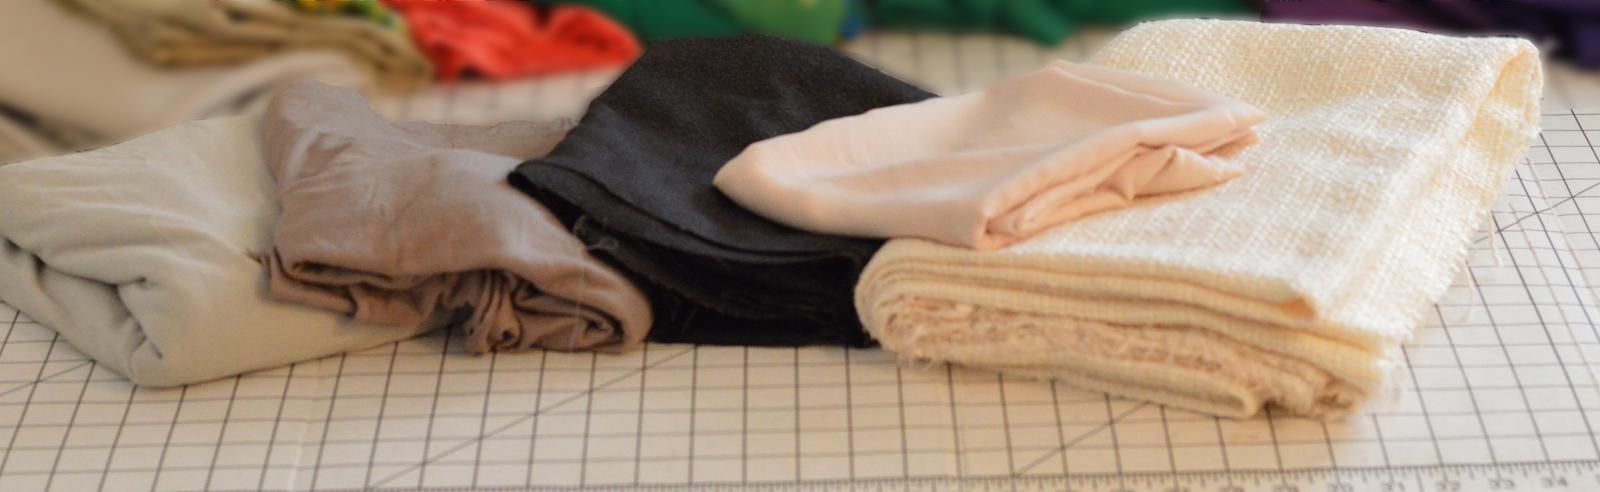 Rhianna's Studio Fabric Haul - Fabric Mart